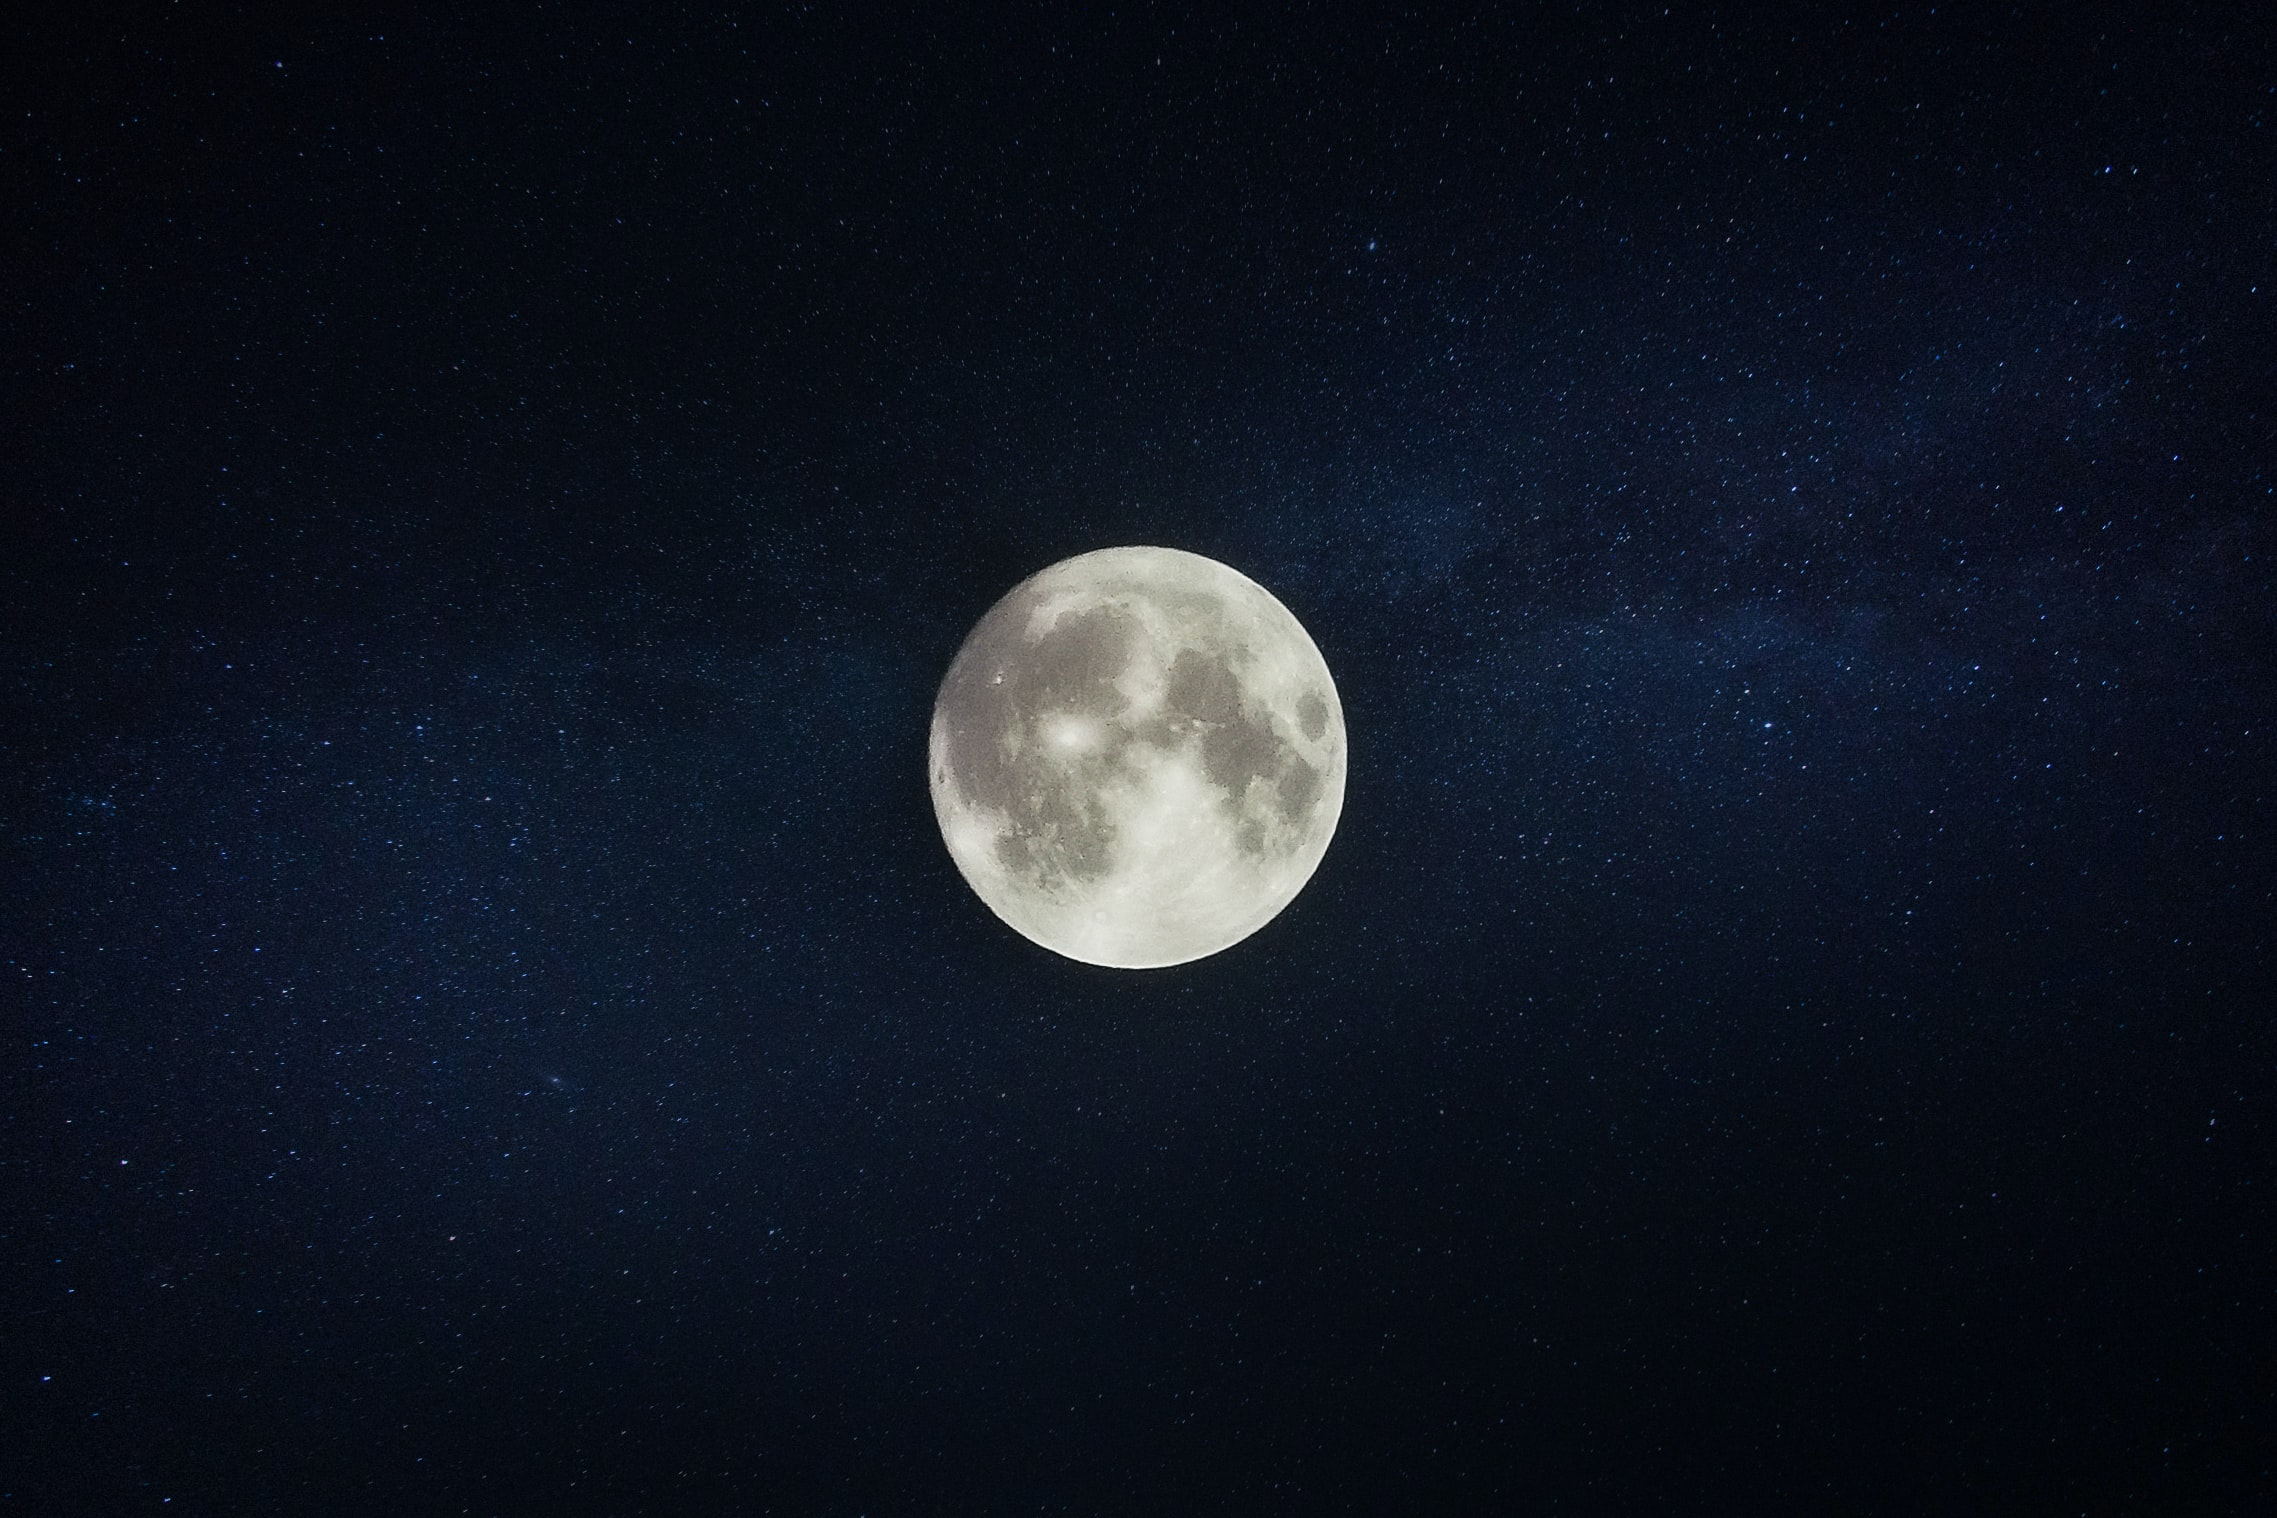 The full moon on a starry sky over Mainz